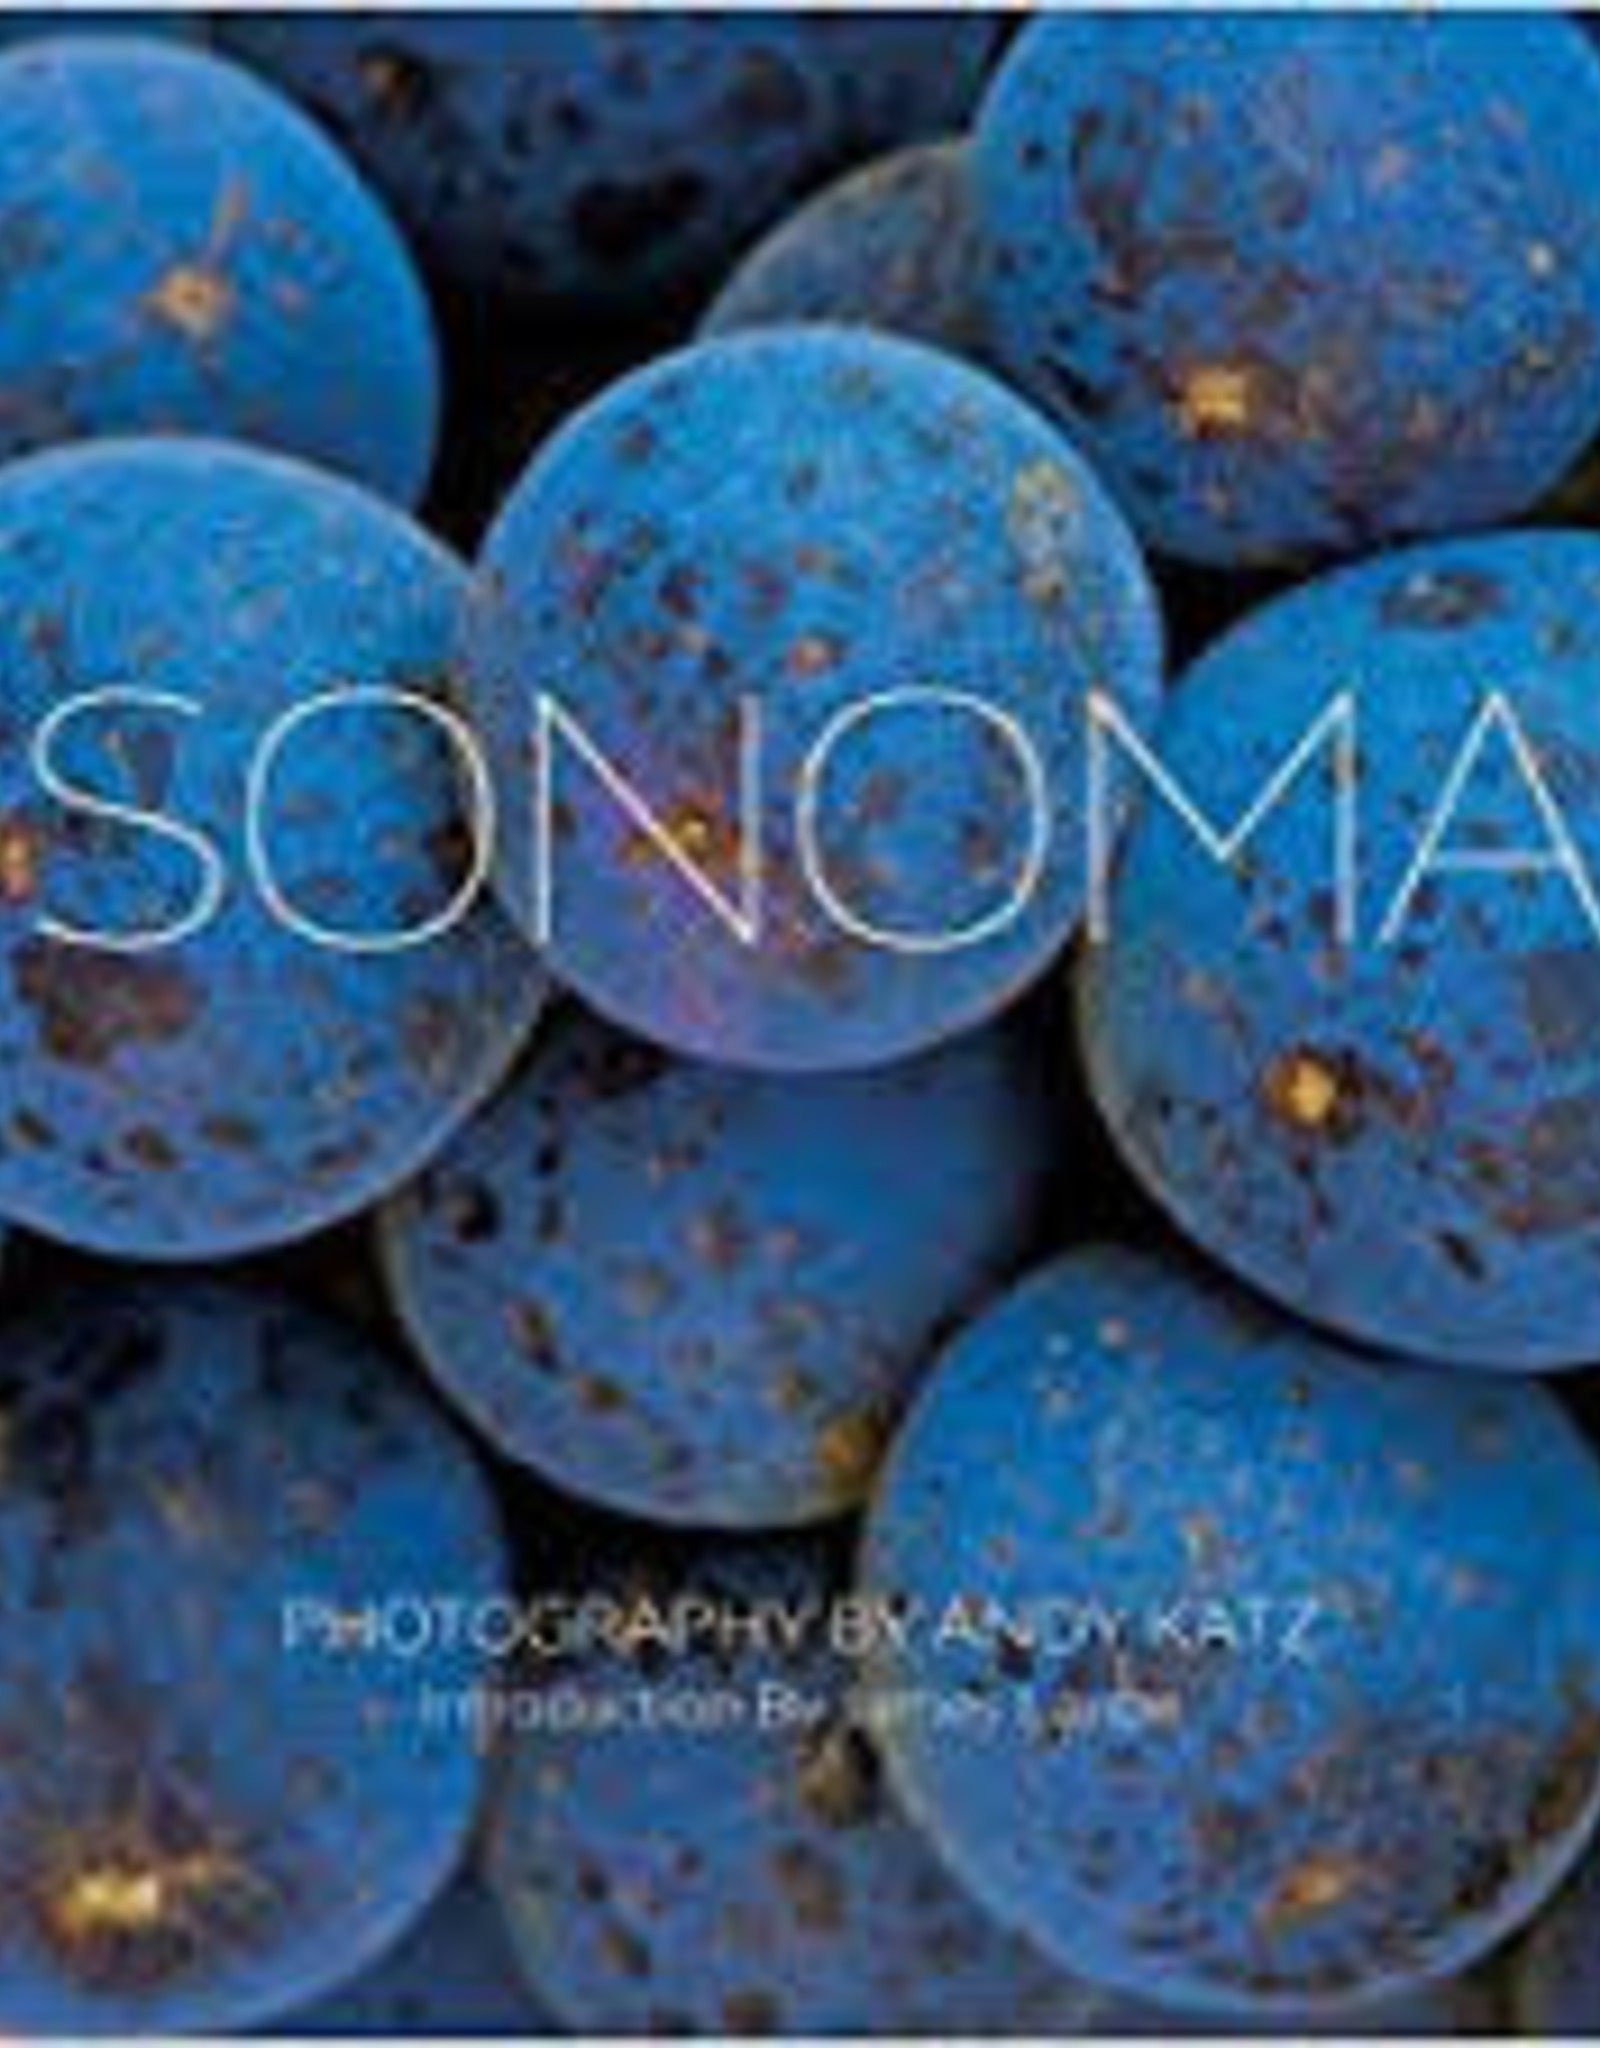 Sonoma, Andy Katz - Books